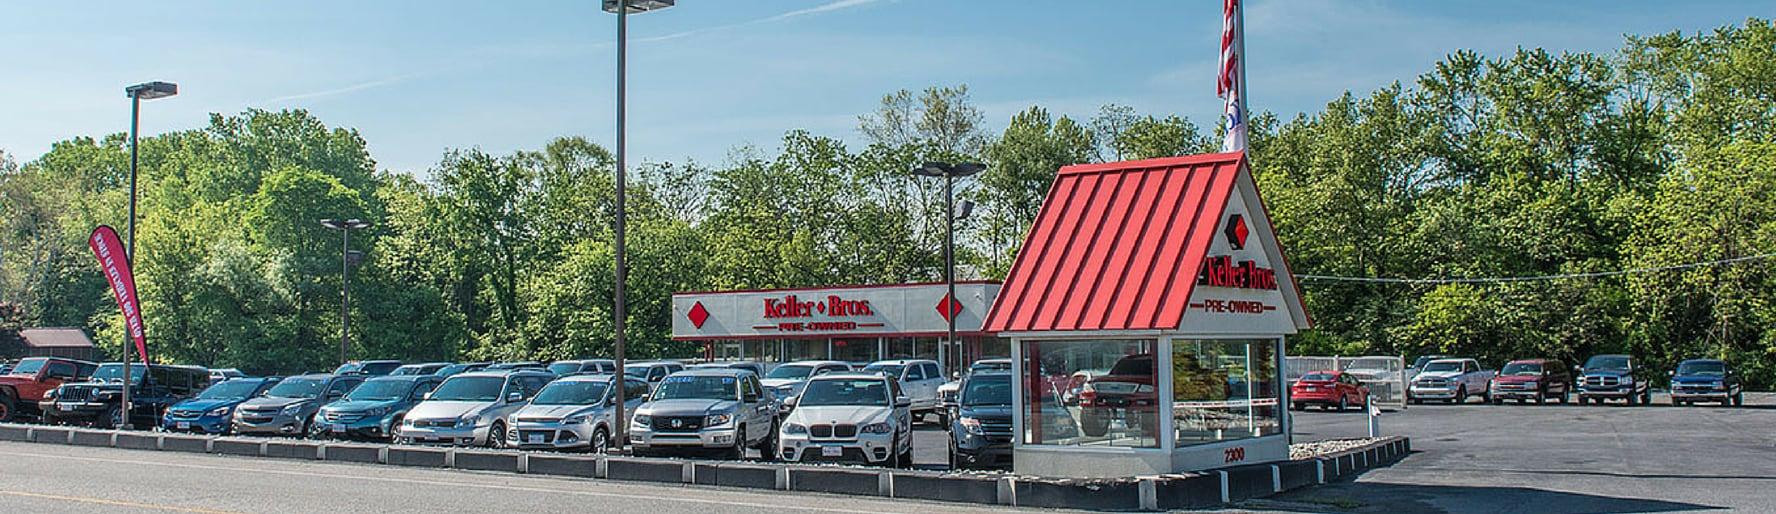 Keller Brothers Ford >> Keller Bros Pre Owned Used Car Dealership In Lebanon Pa